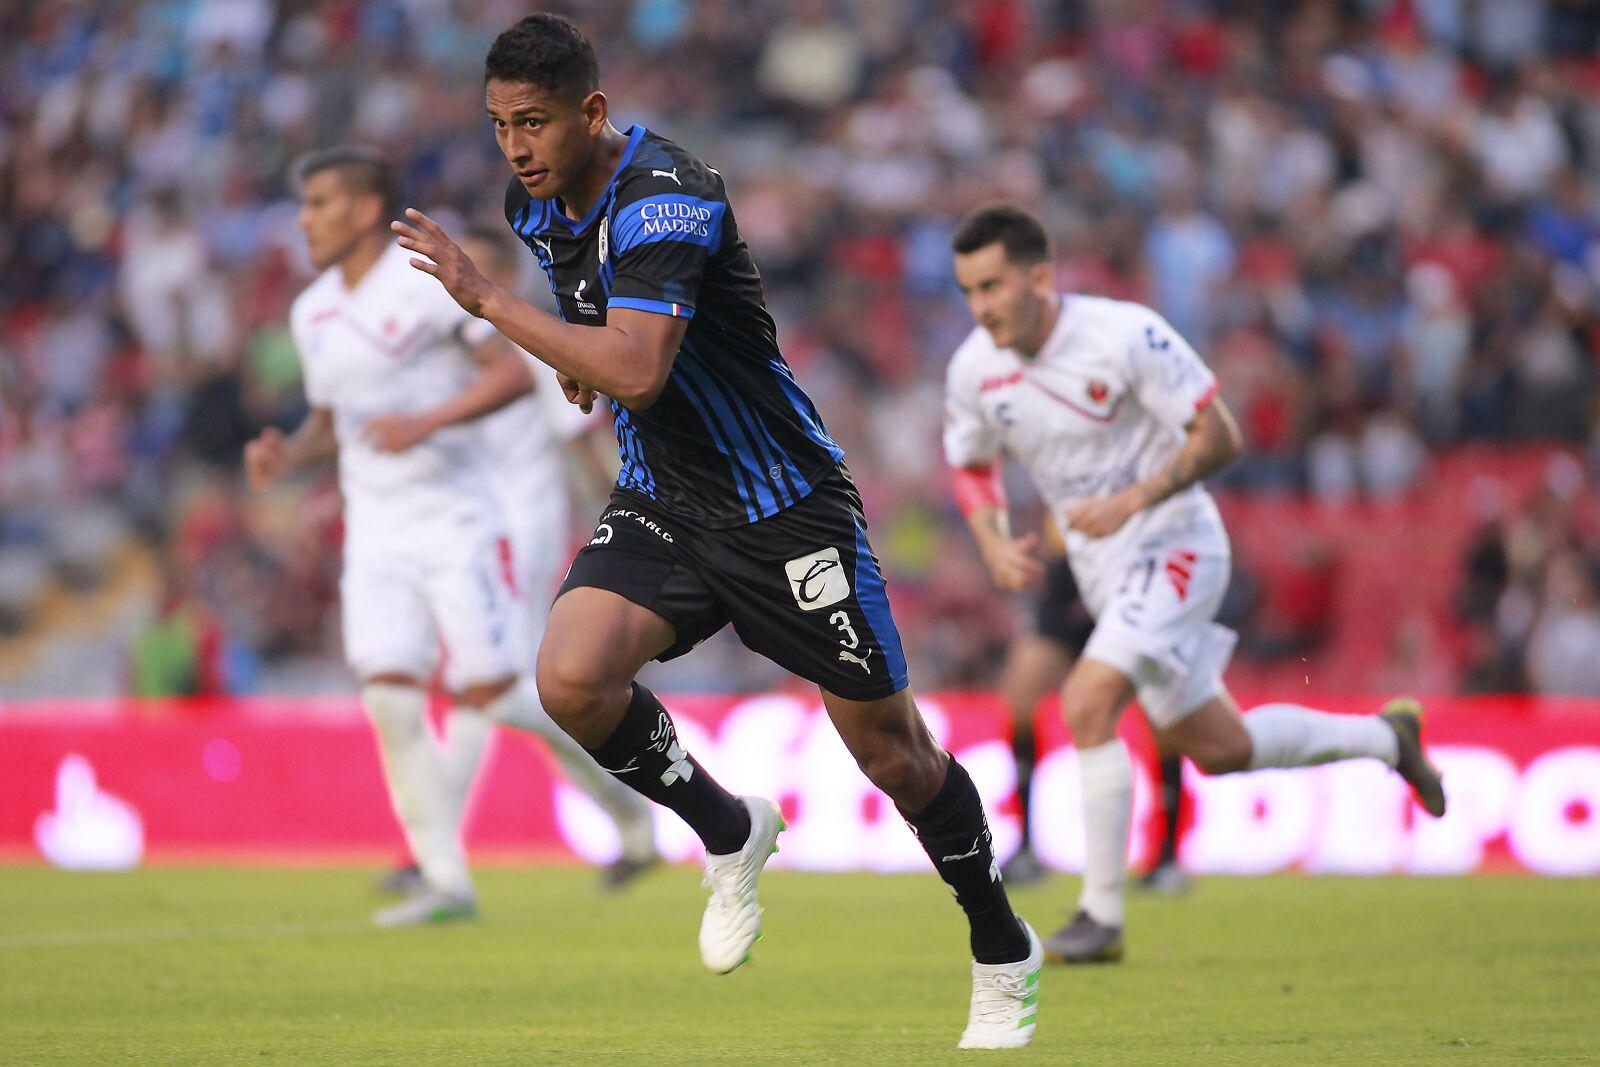 0f109485da75b After first loss, Queretaro pays a visit to Veracruz - The 5th News